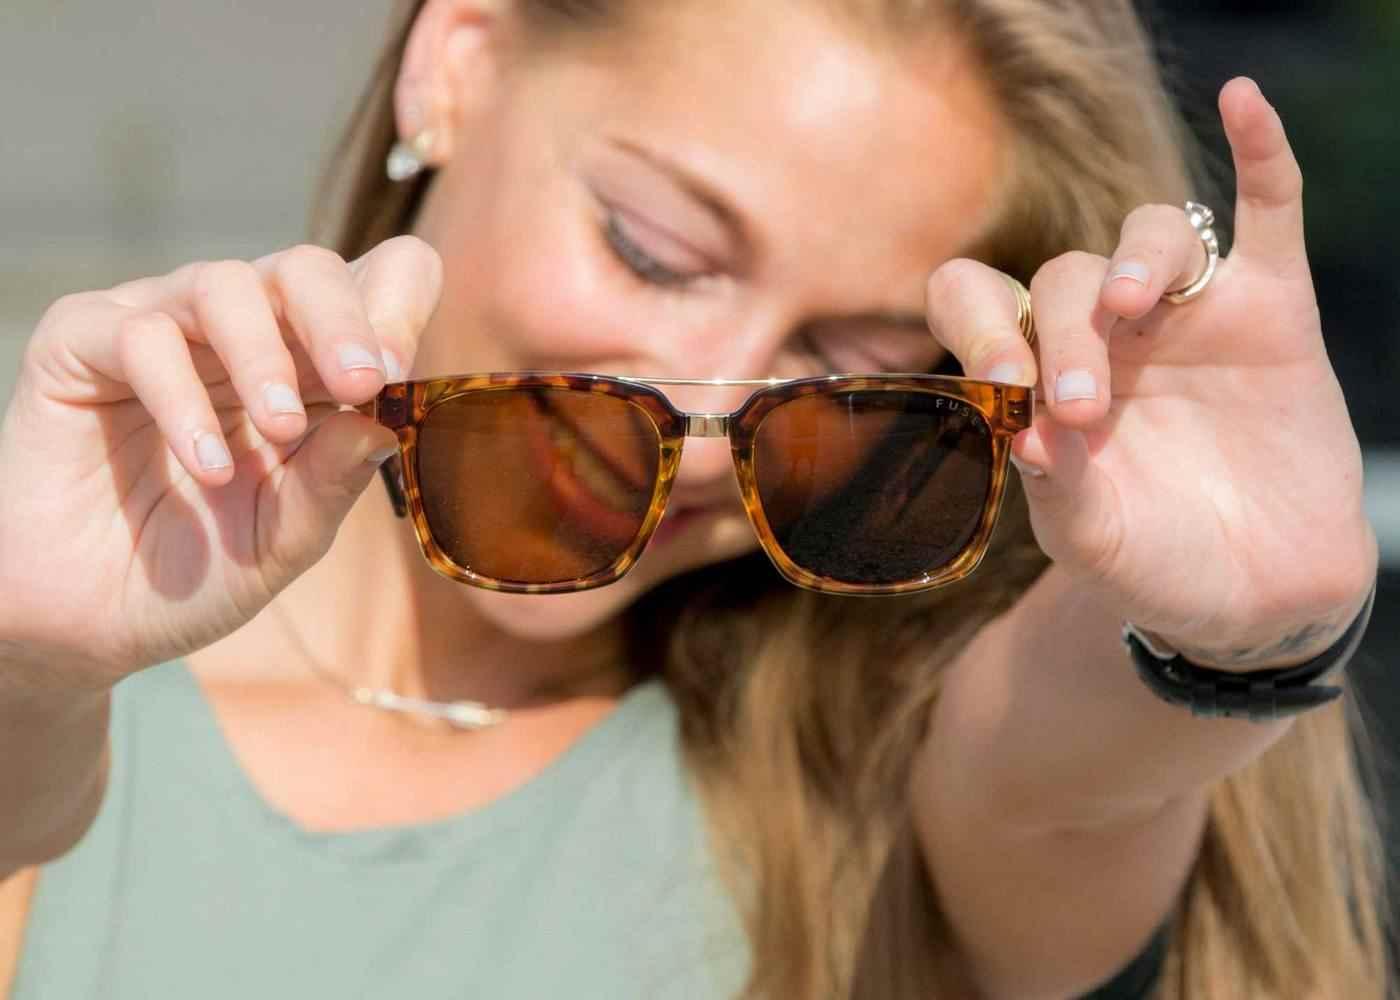 Fuse Lenses Fuse Plus Replacement Lenses for Von Zipper Fulton